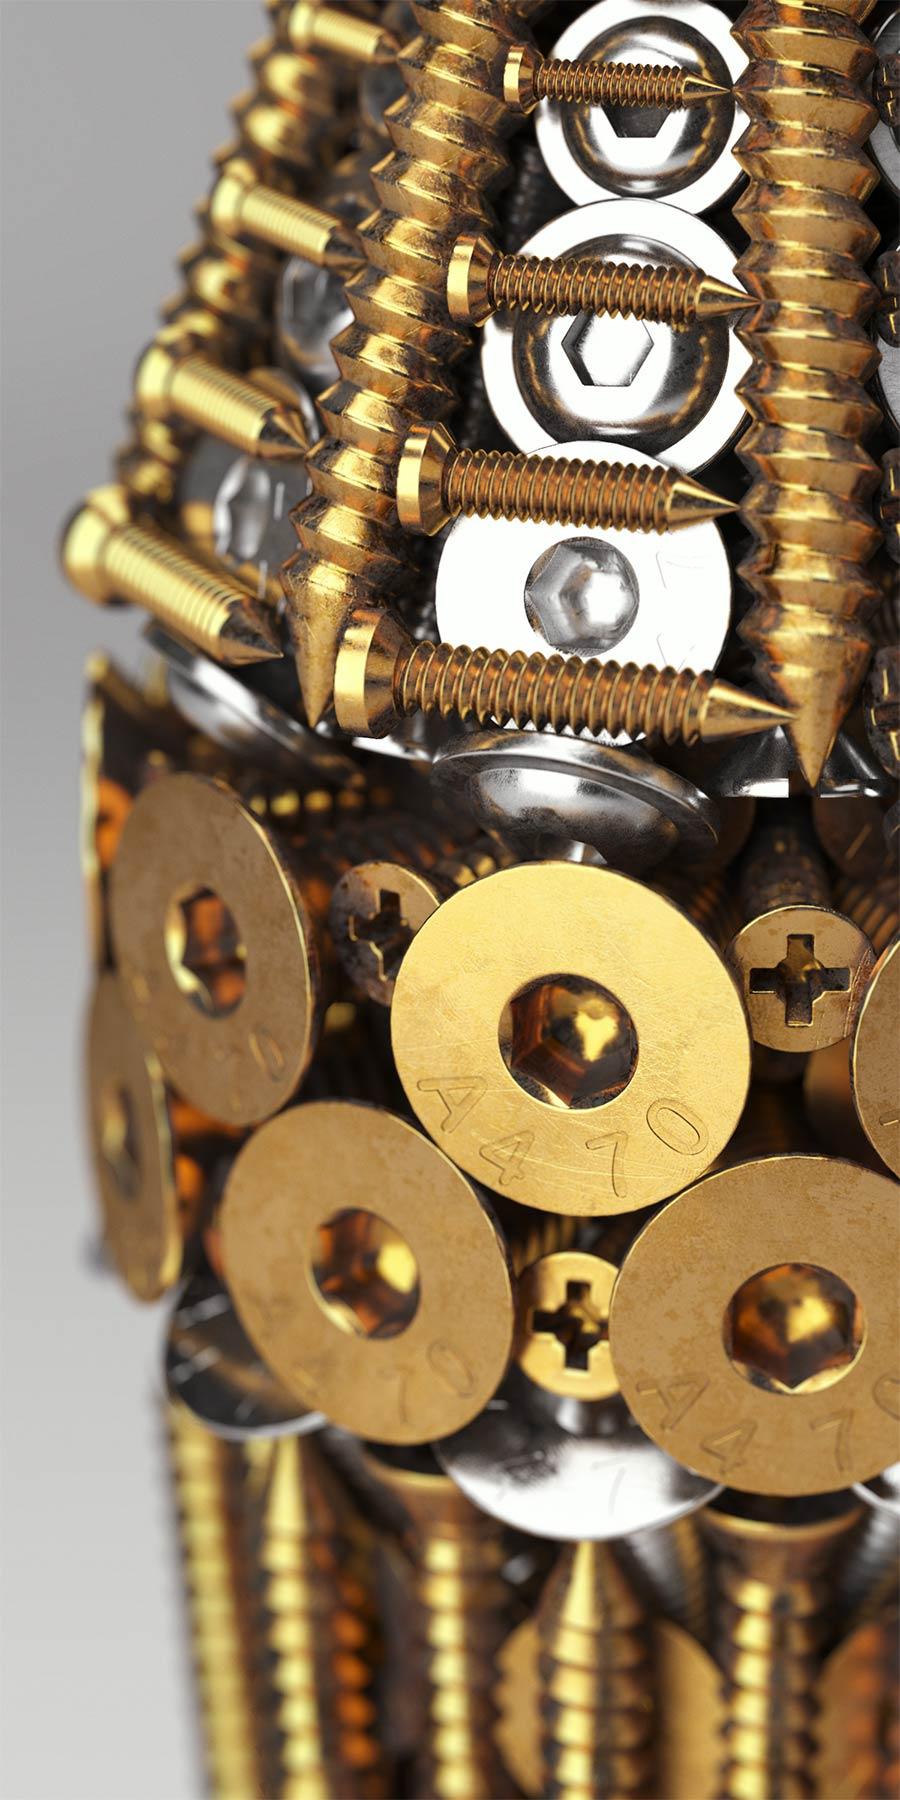 Hammer aus Nägeln Tools_Barrera-Montenegro_04